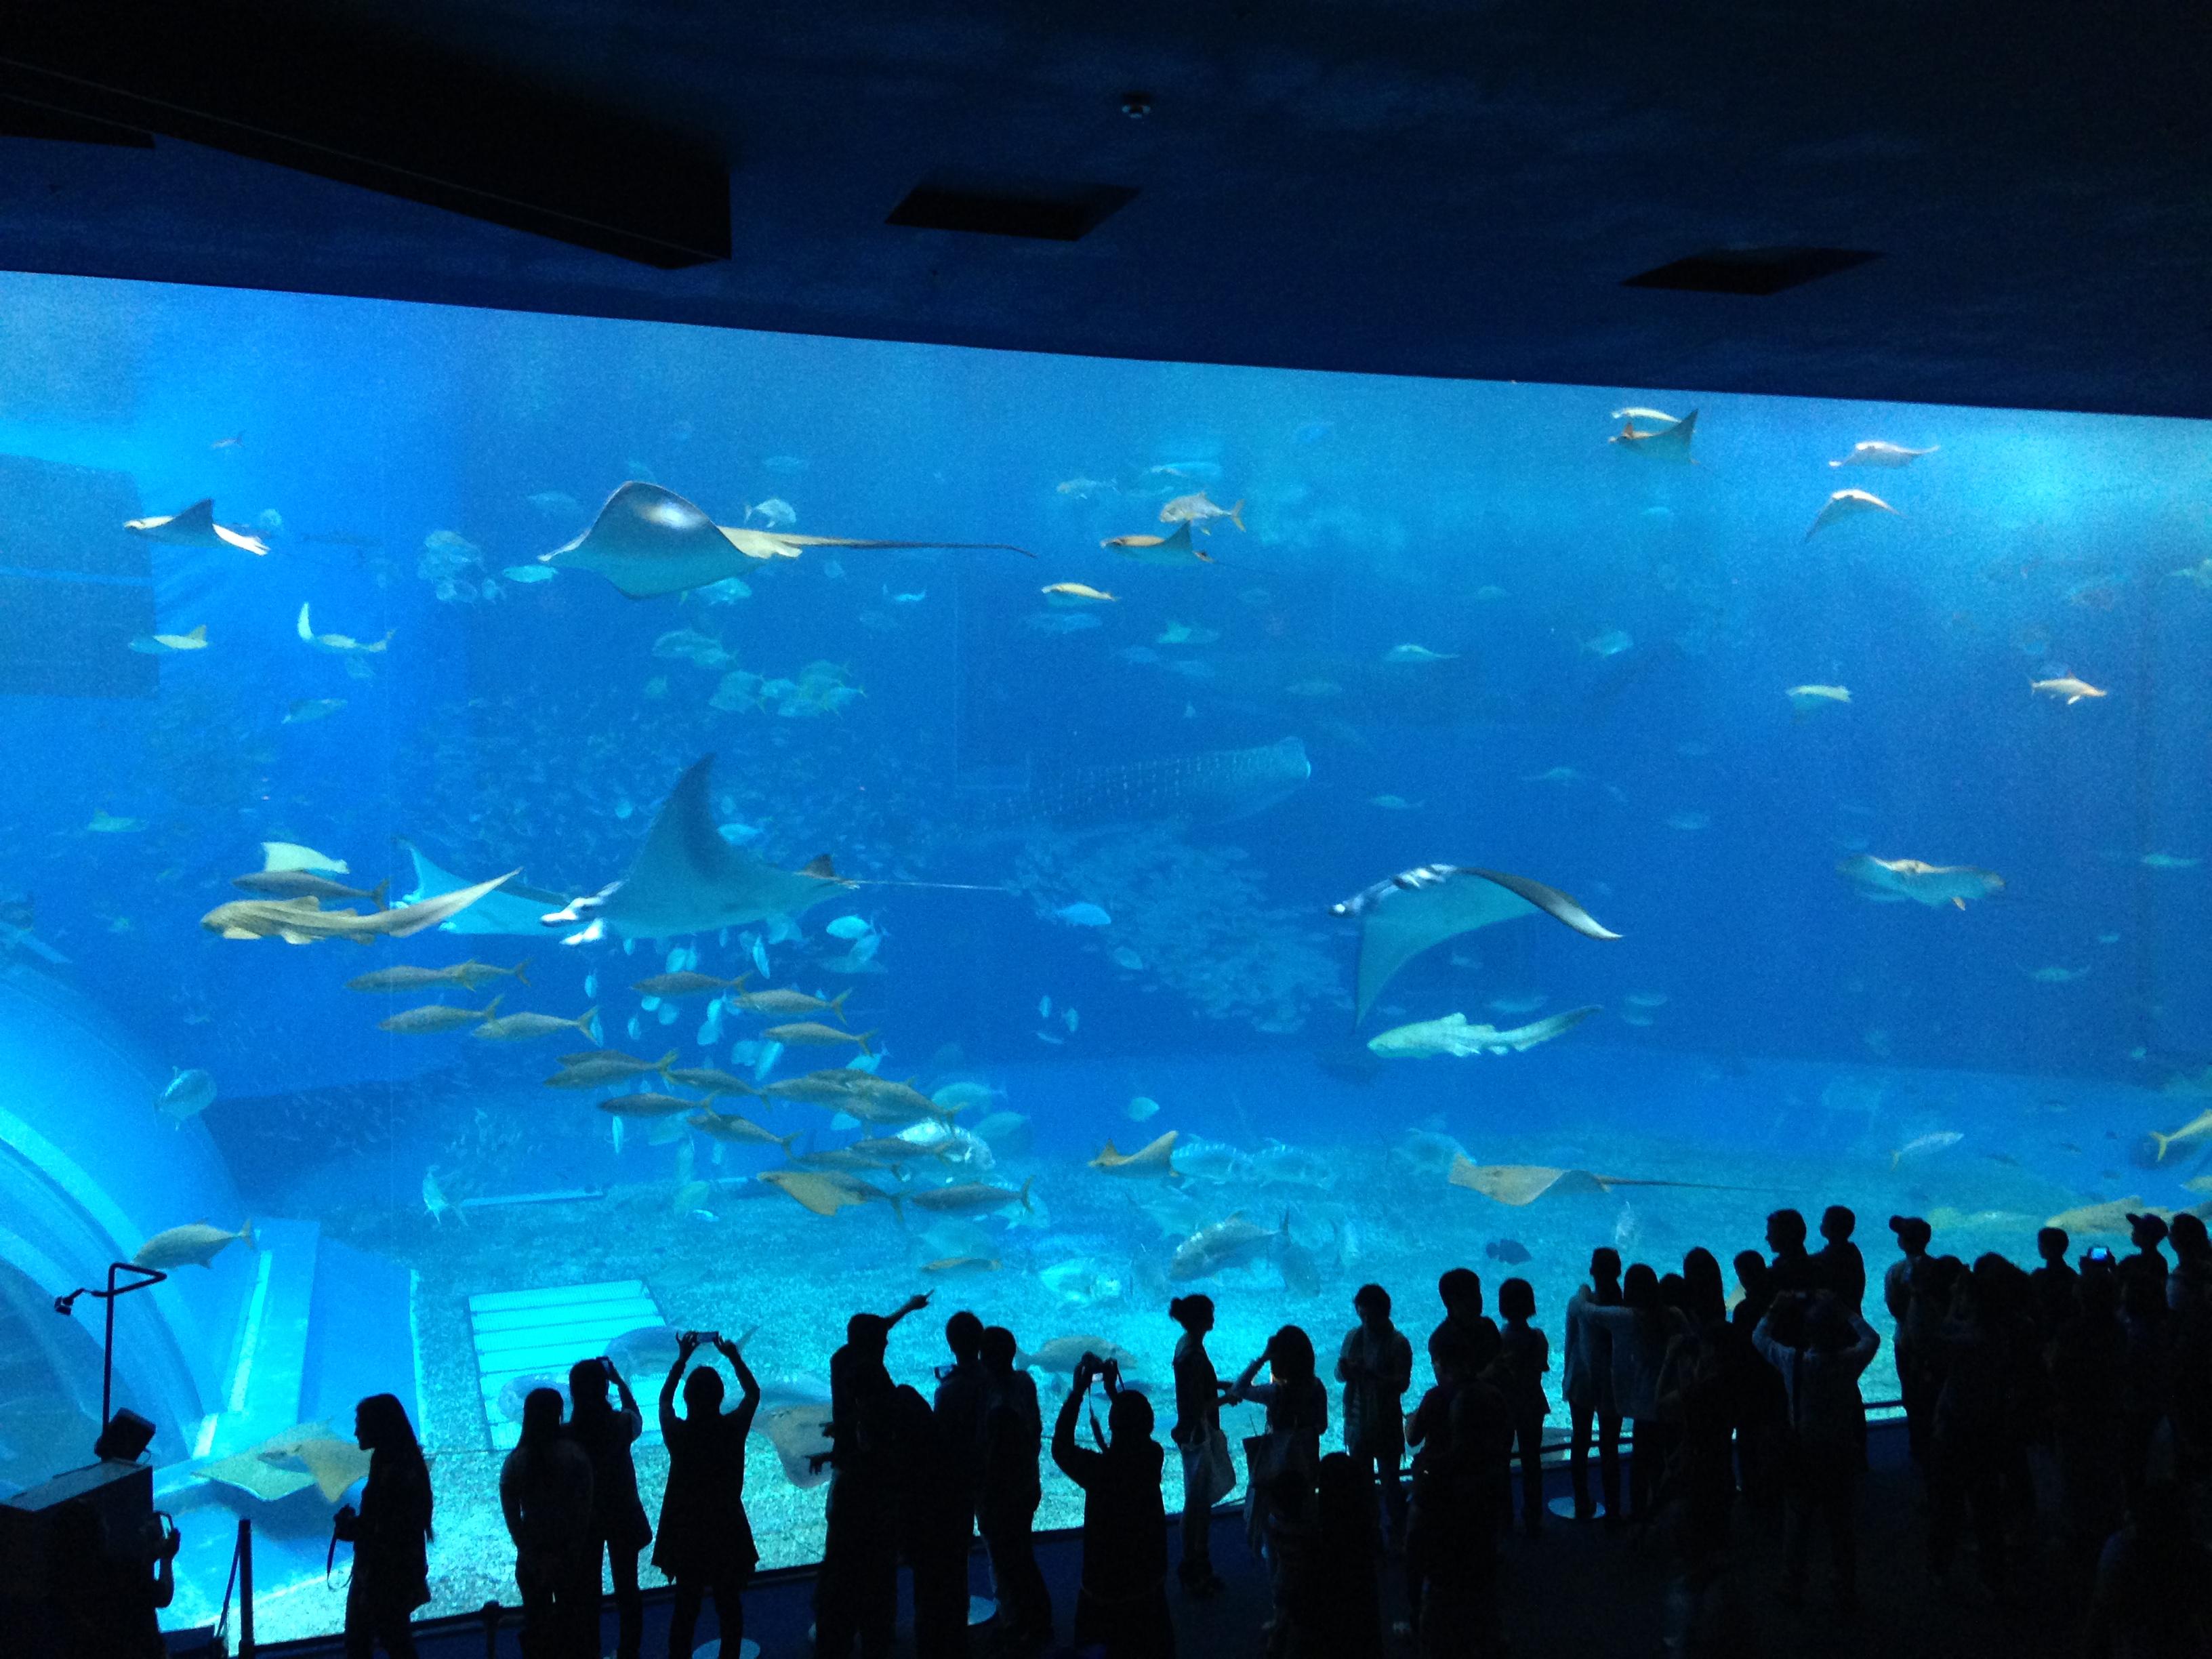 Okinawa Churaumi Aquarium 2